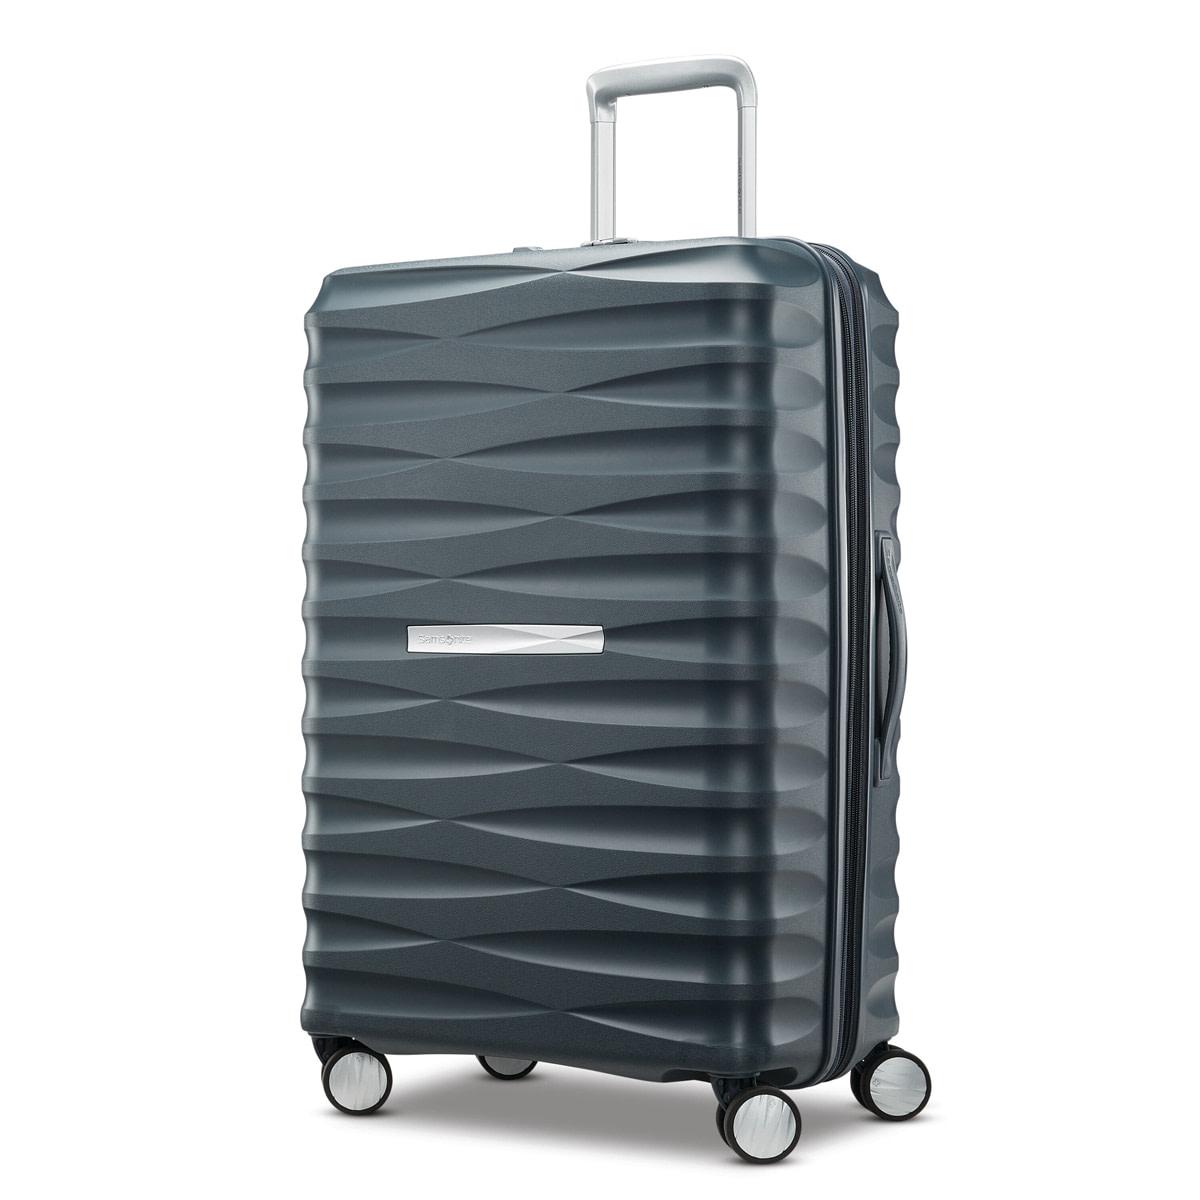 Best Lightweight Checked Luggage